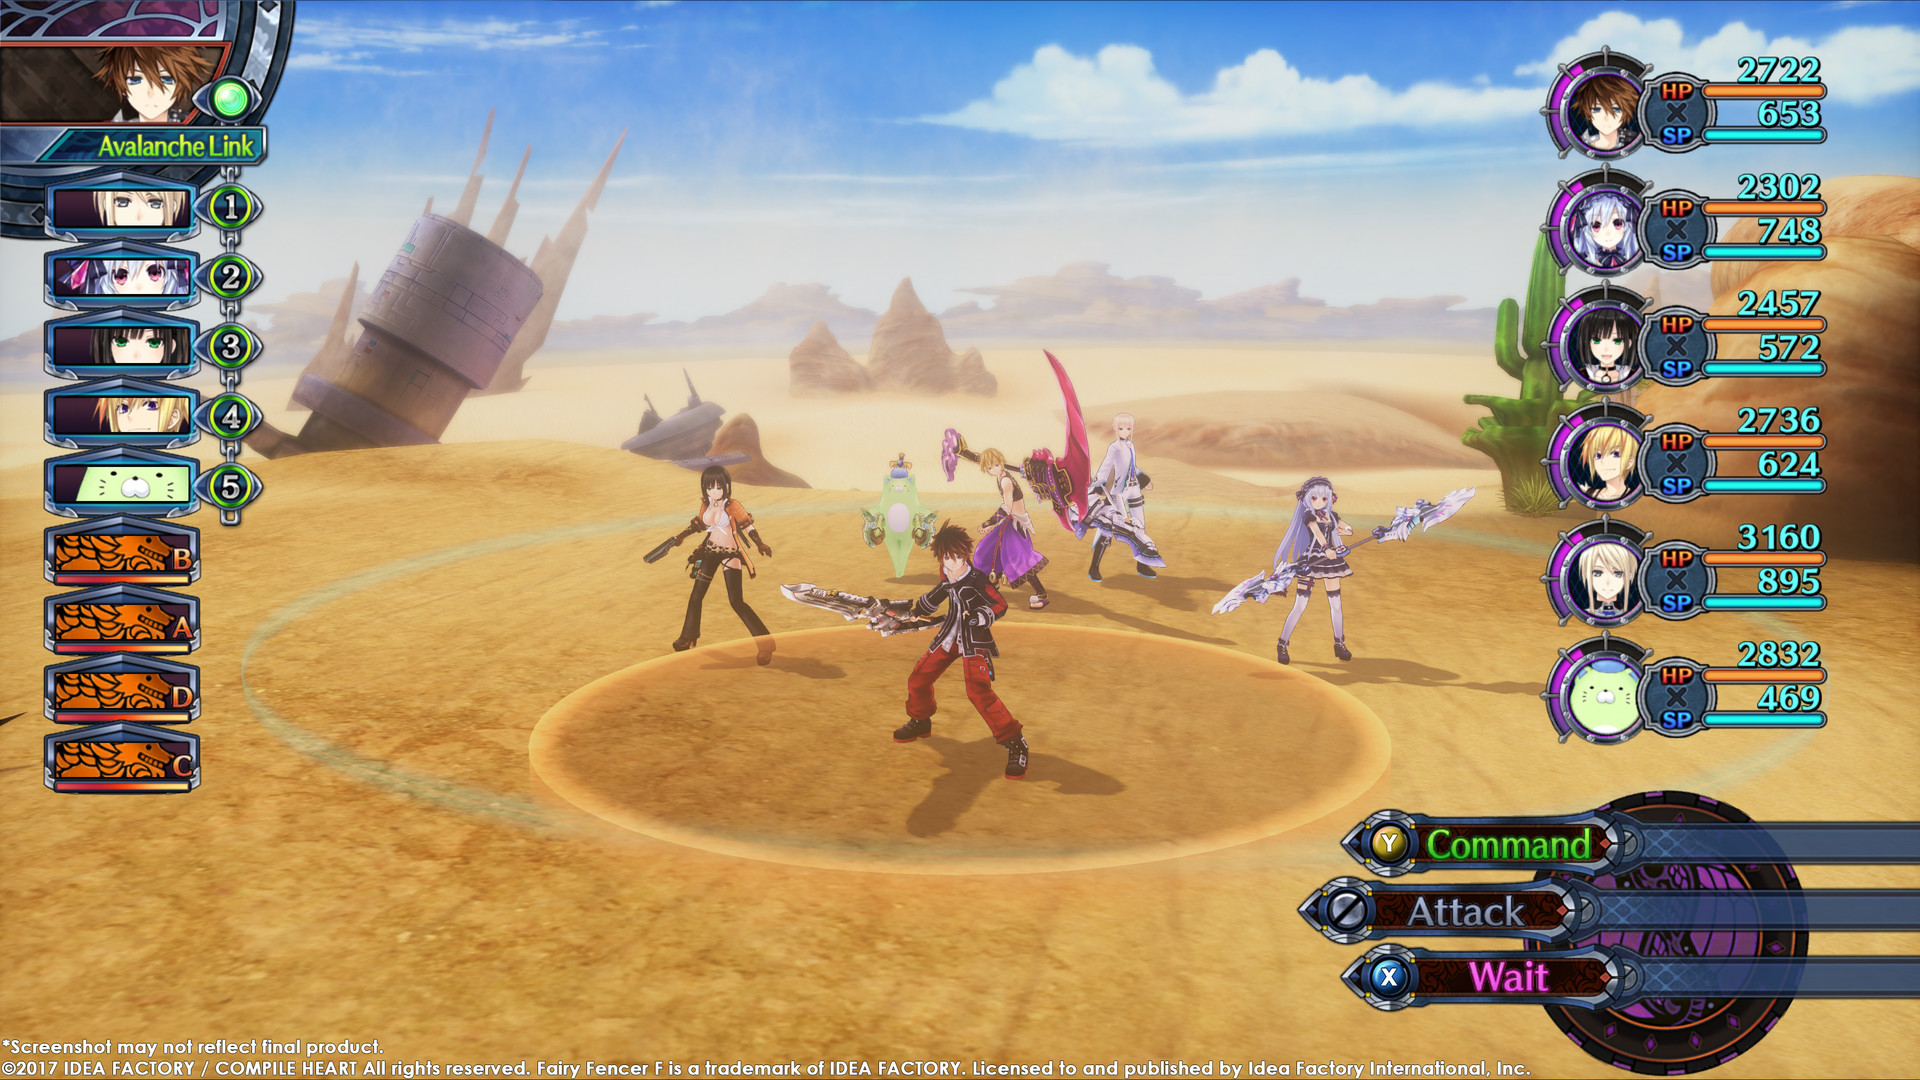 Fairy Fencer F: Advent Dark Force Screenshot 2